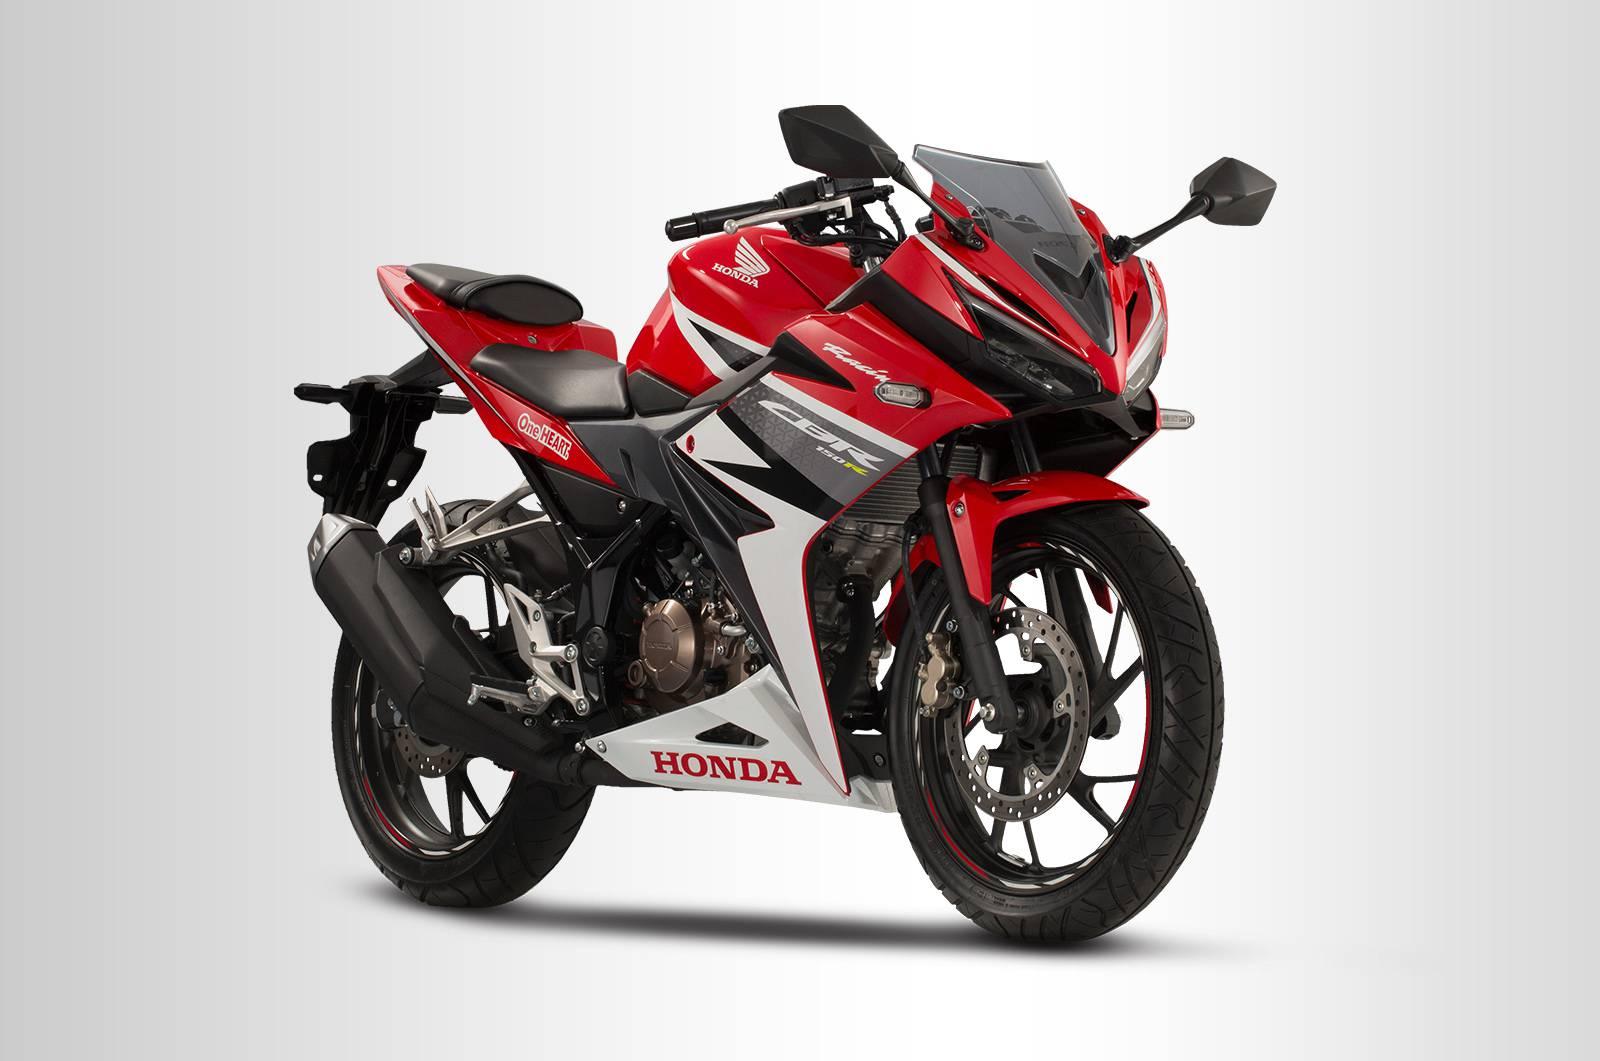 Motortrade | Philippine's Best Motorcycle Dealer | HONDA CBR150R